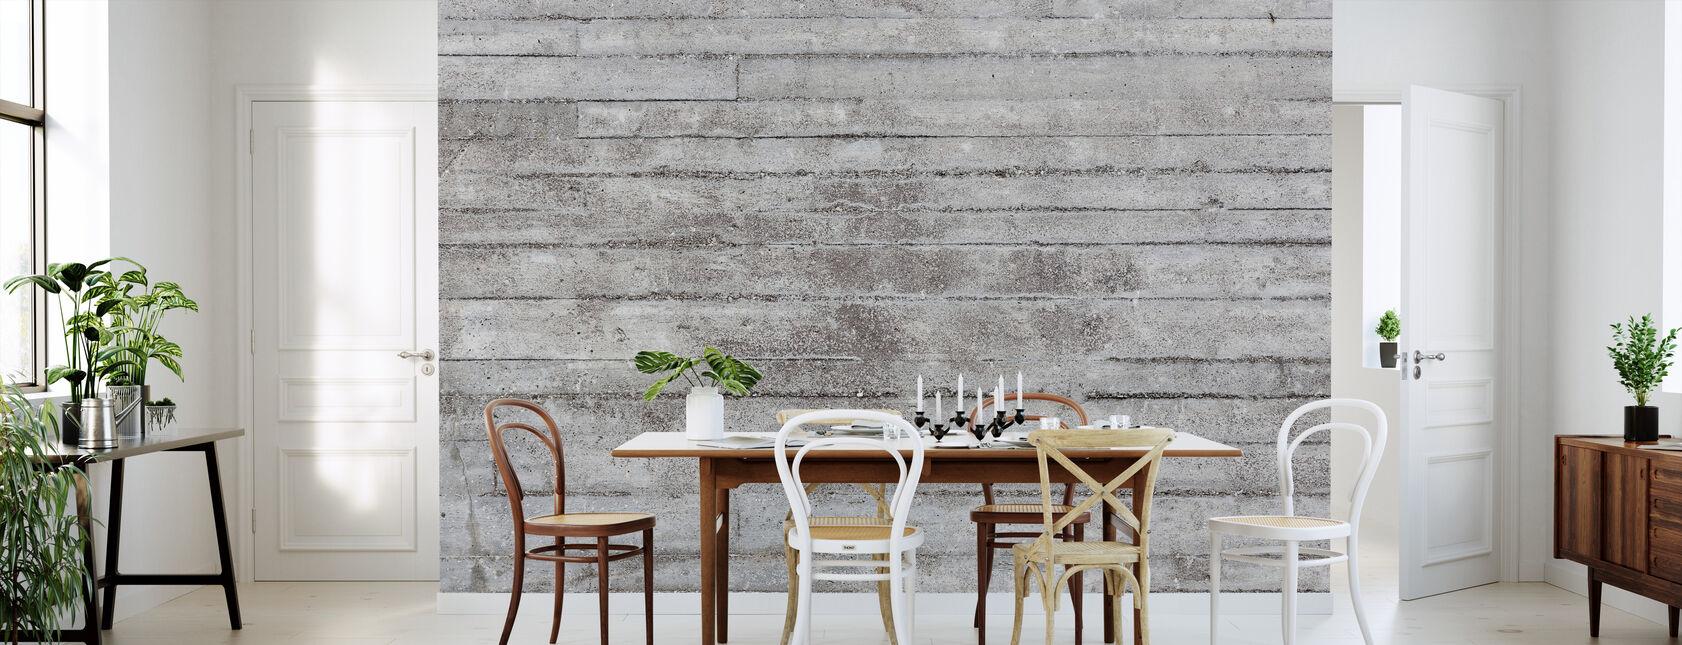 Heavyweight Concrete - Wallpaper - Kitchen